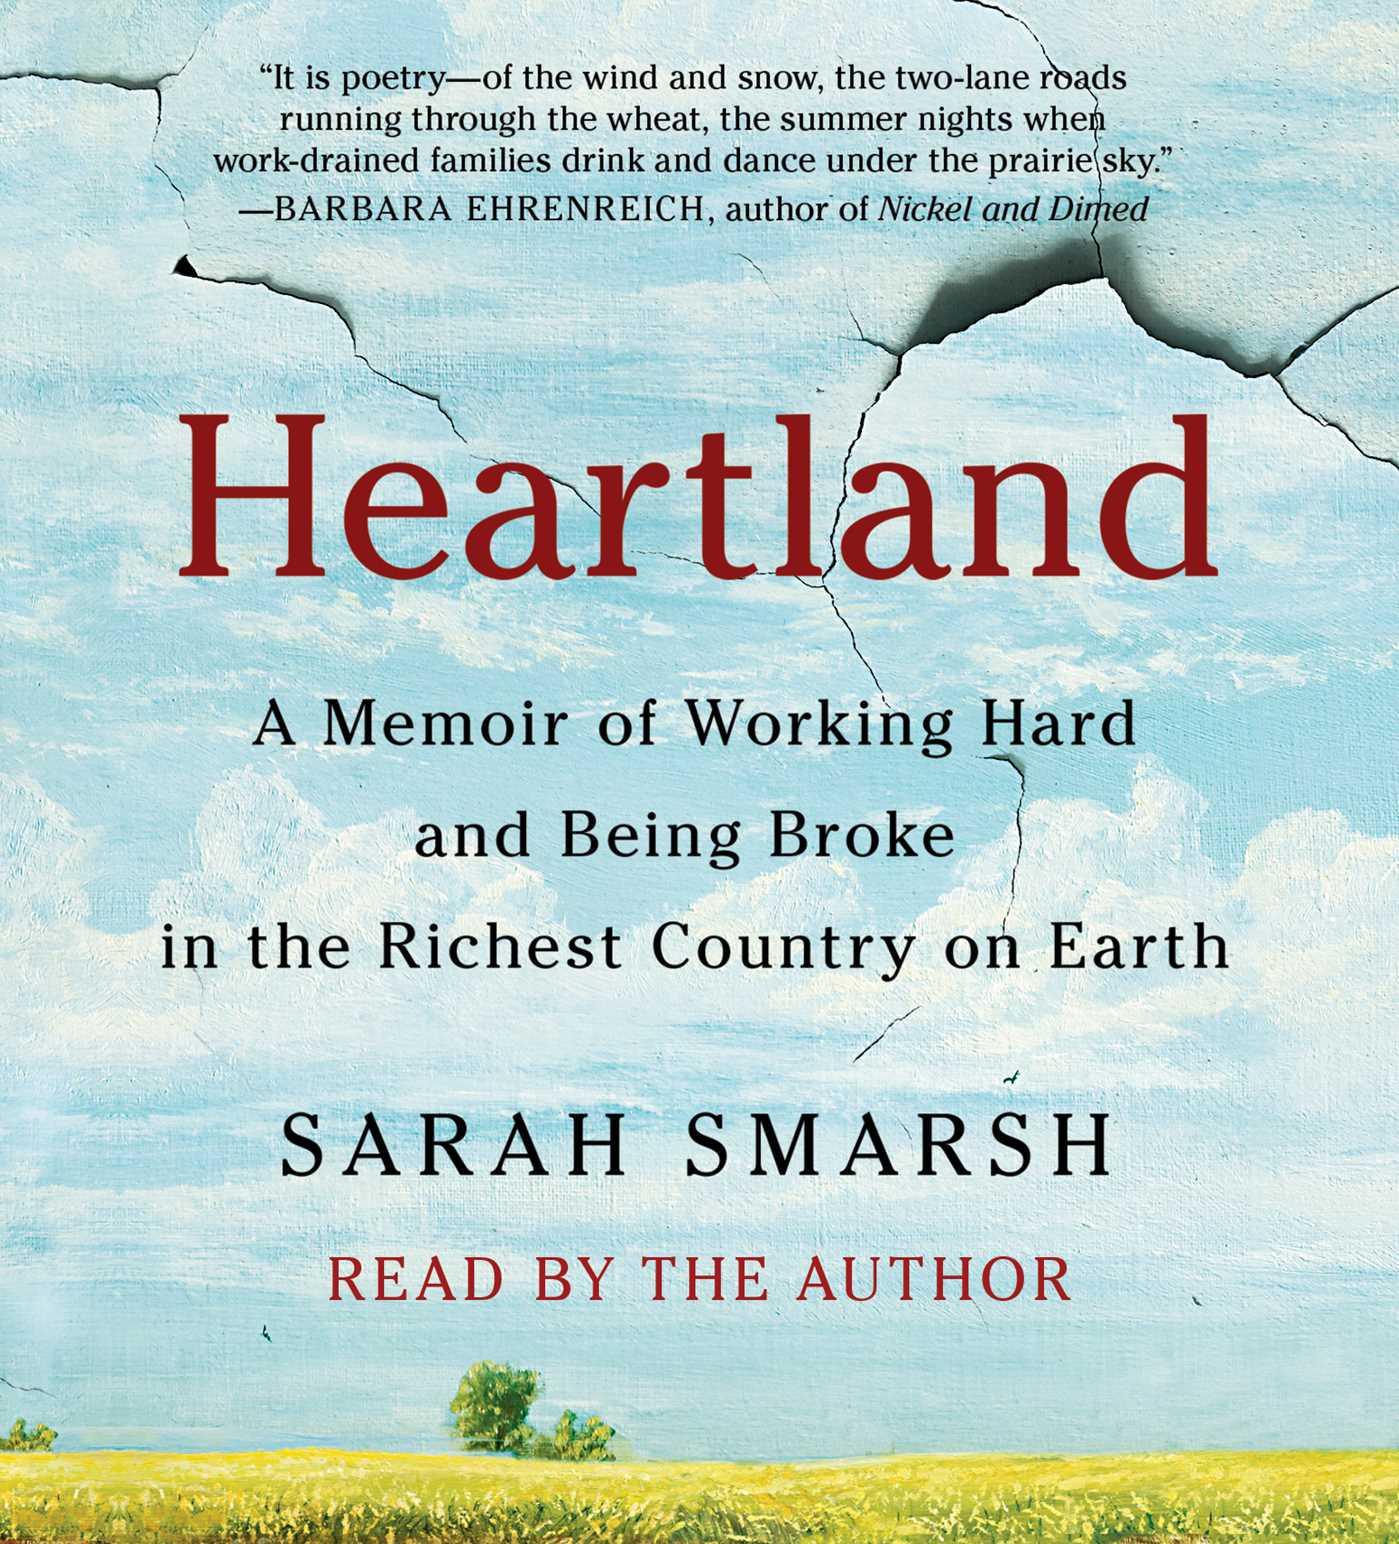 Heartland 9781508267409 hr